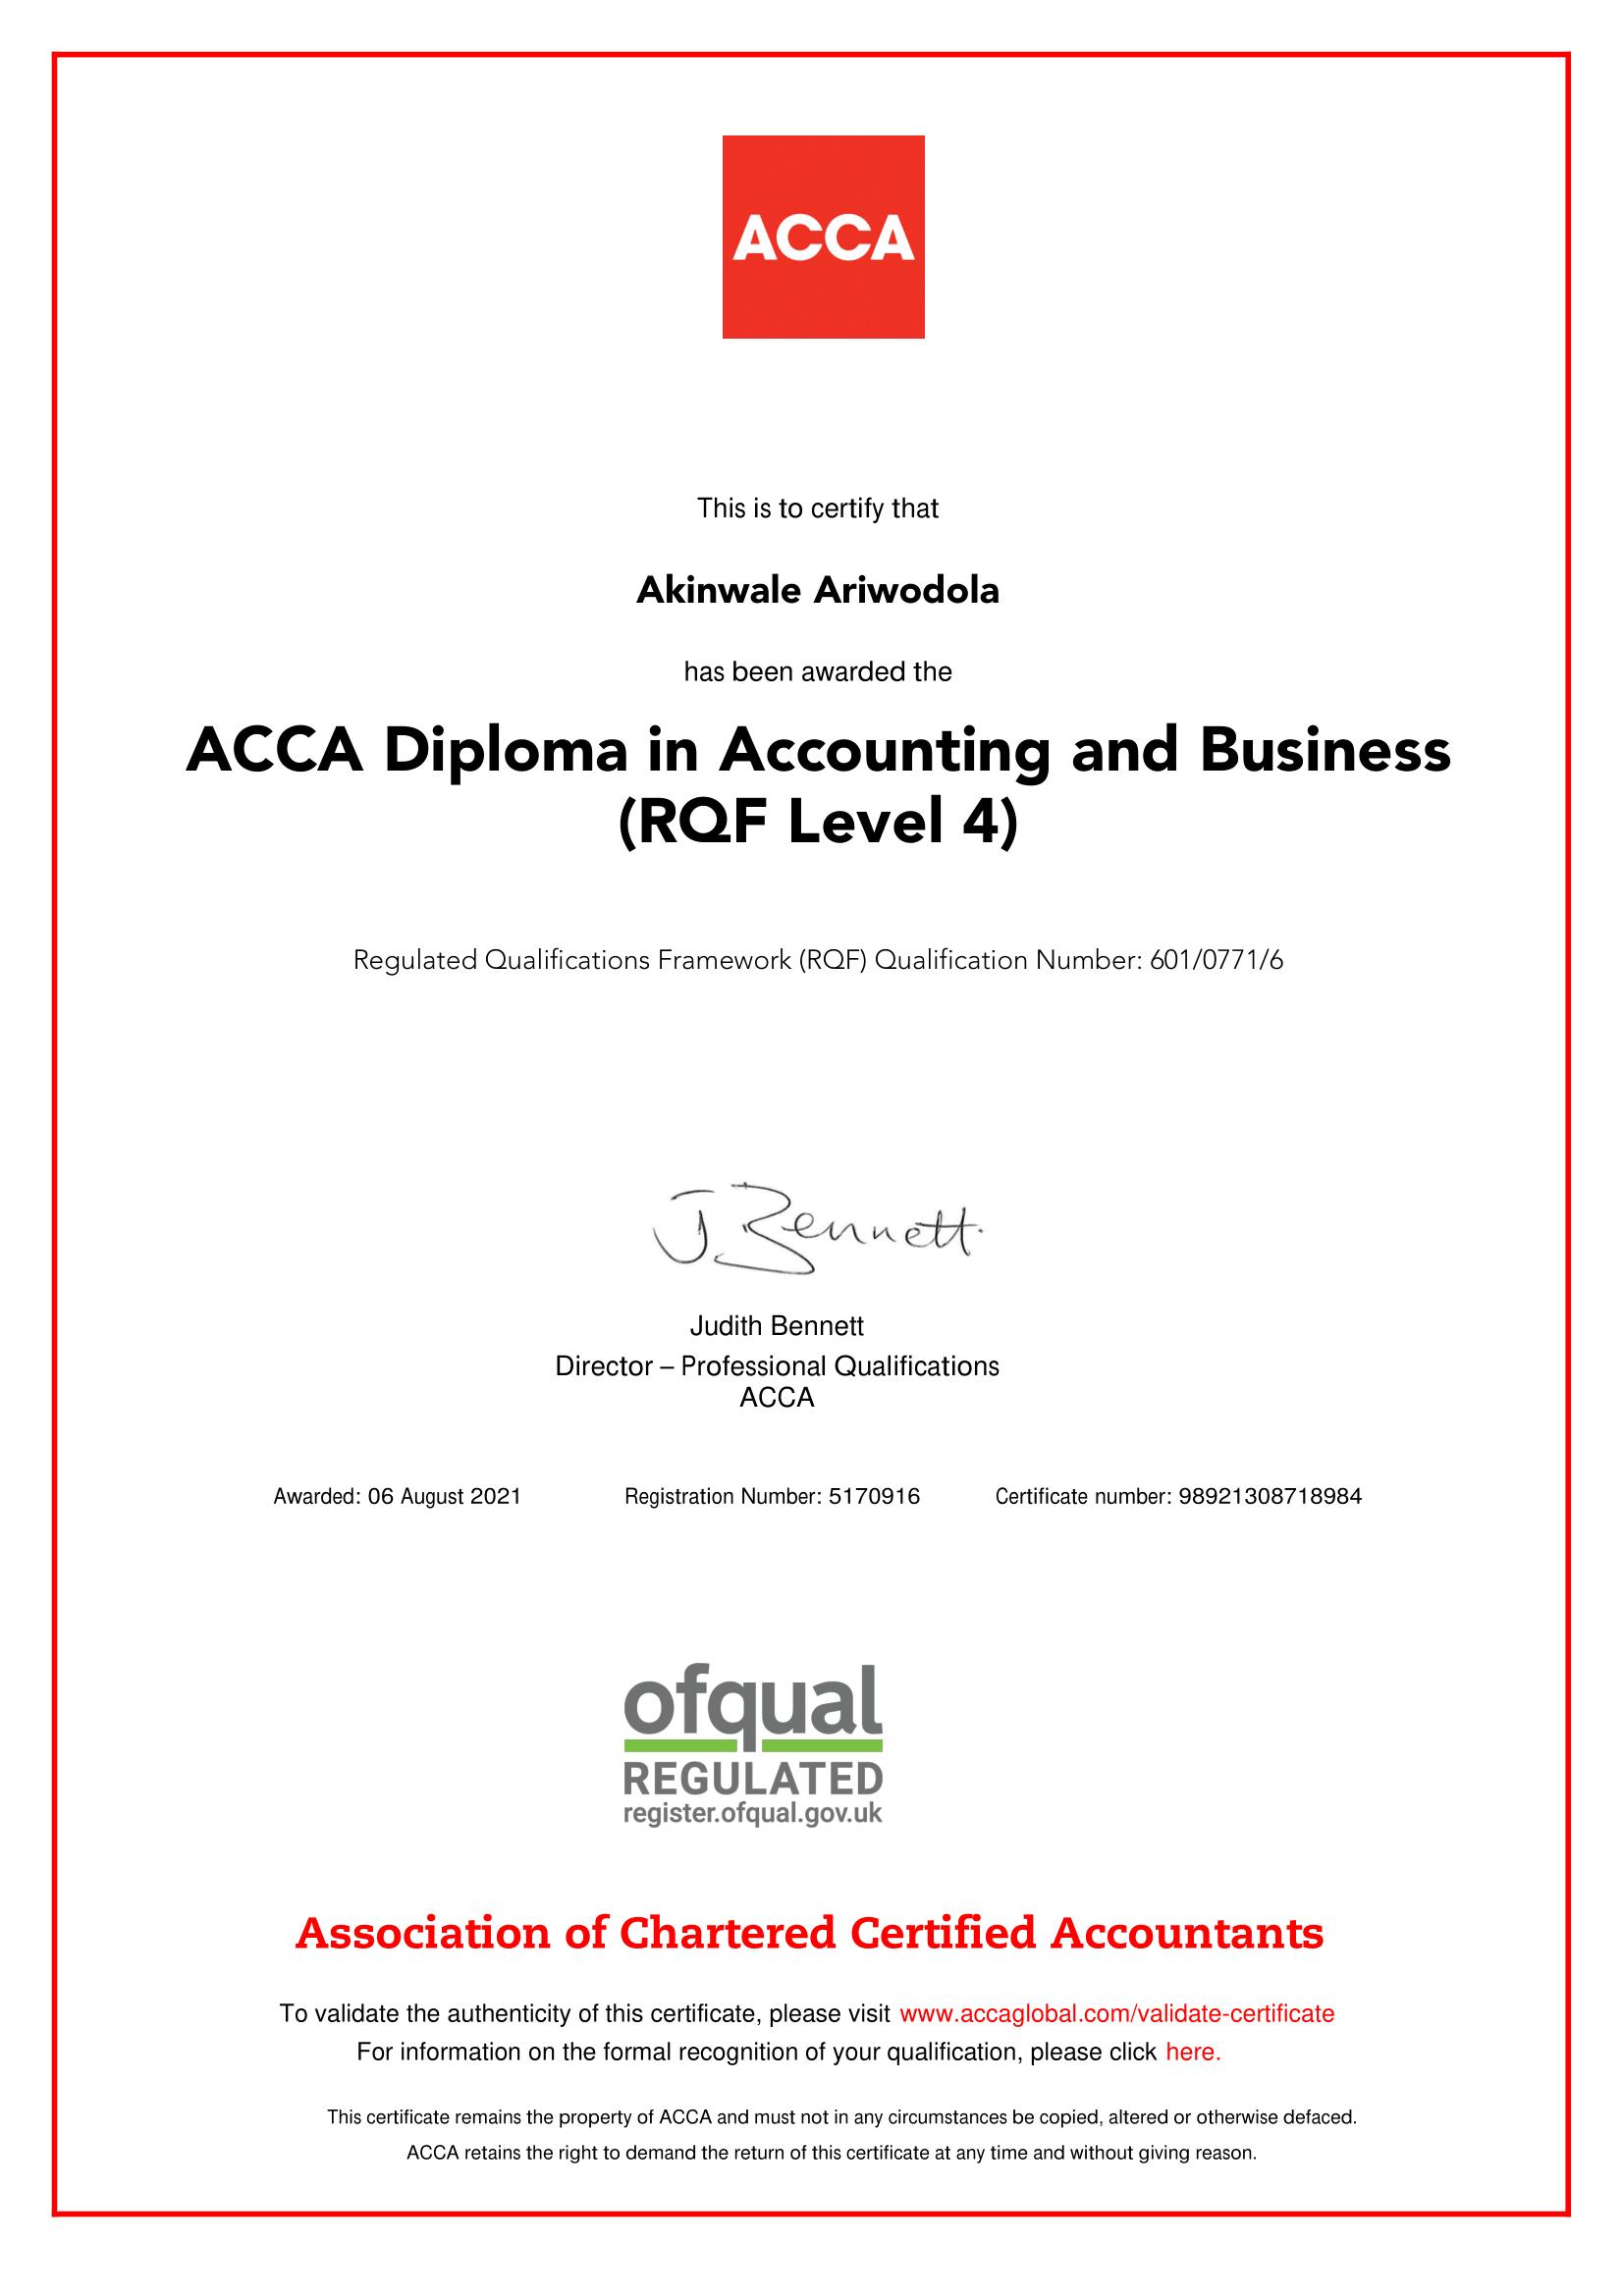 ACCA Diploma in Accounting & Business - Akinwale Ariwodola